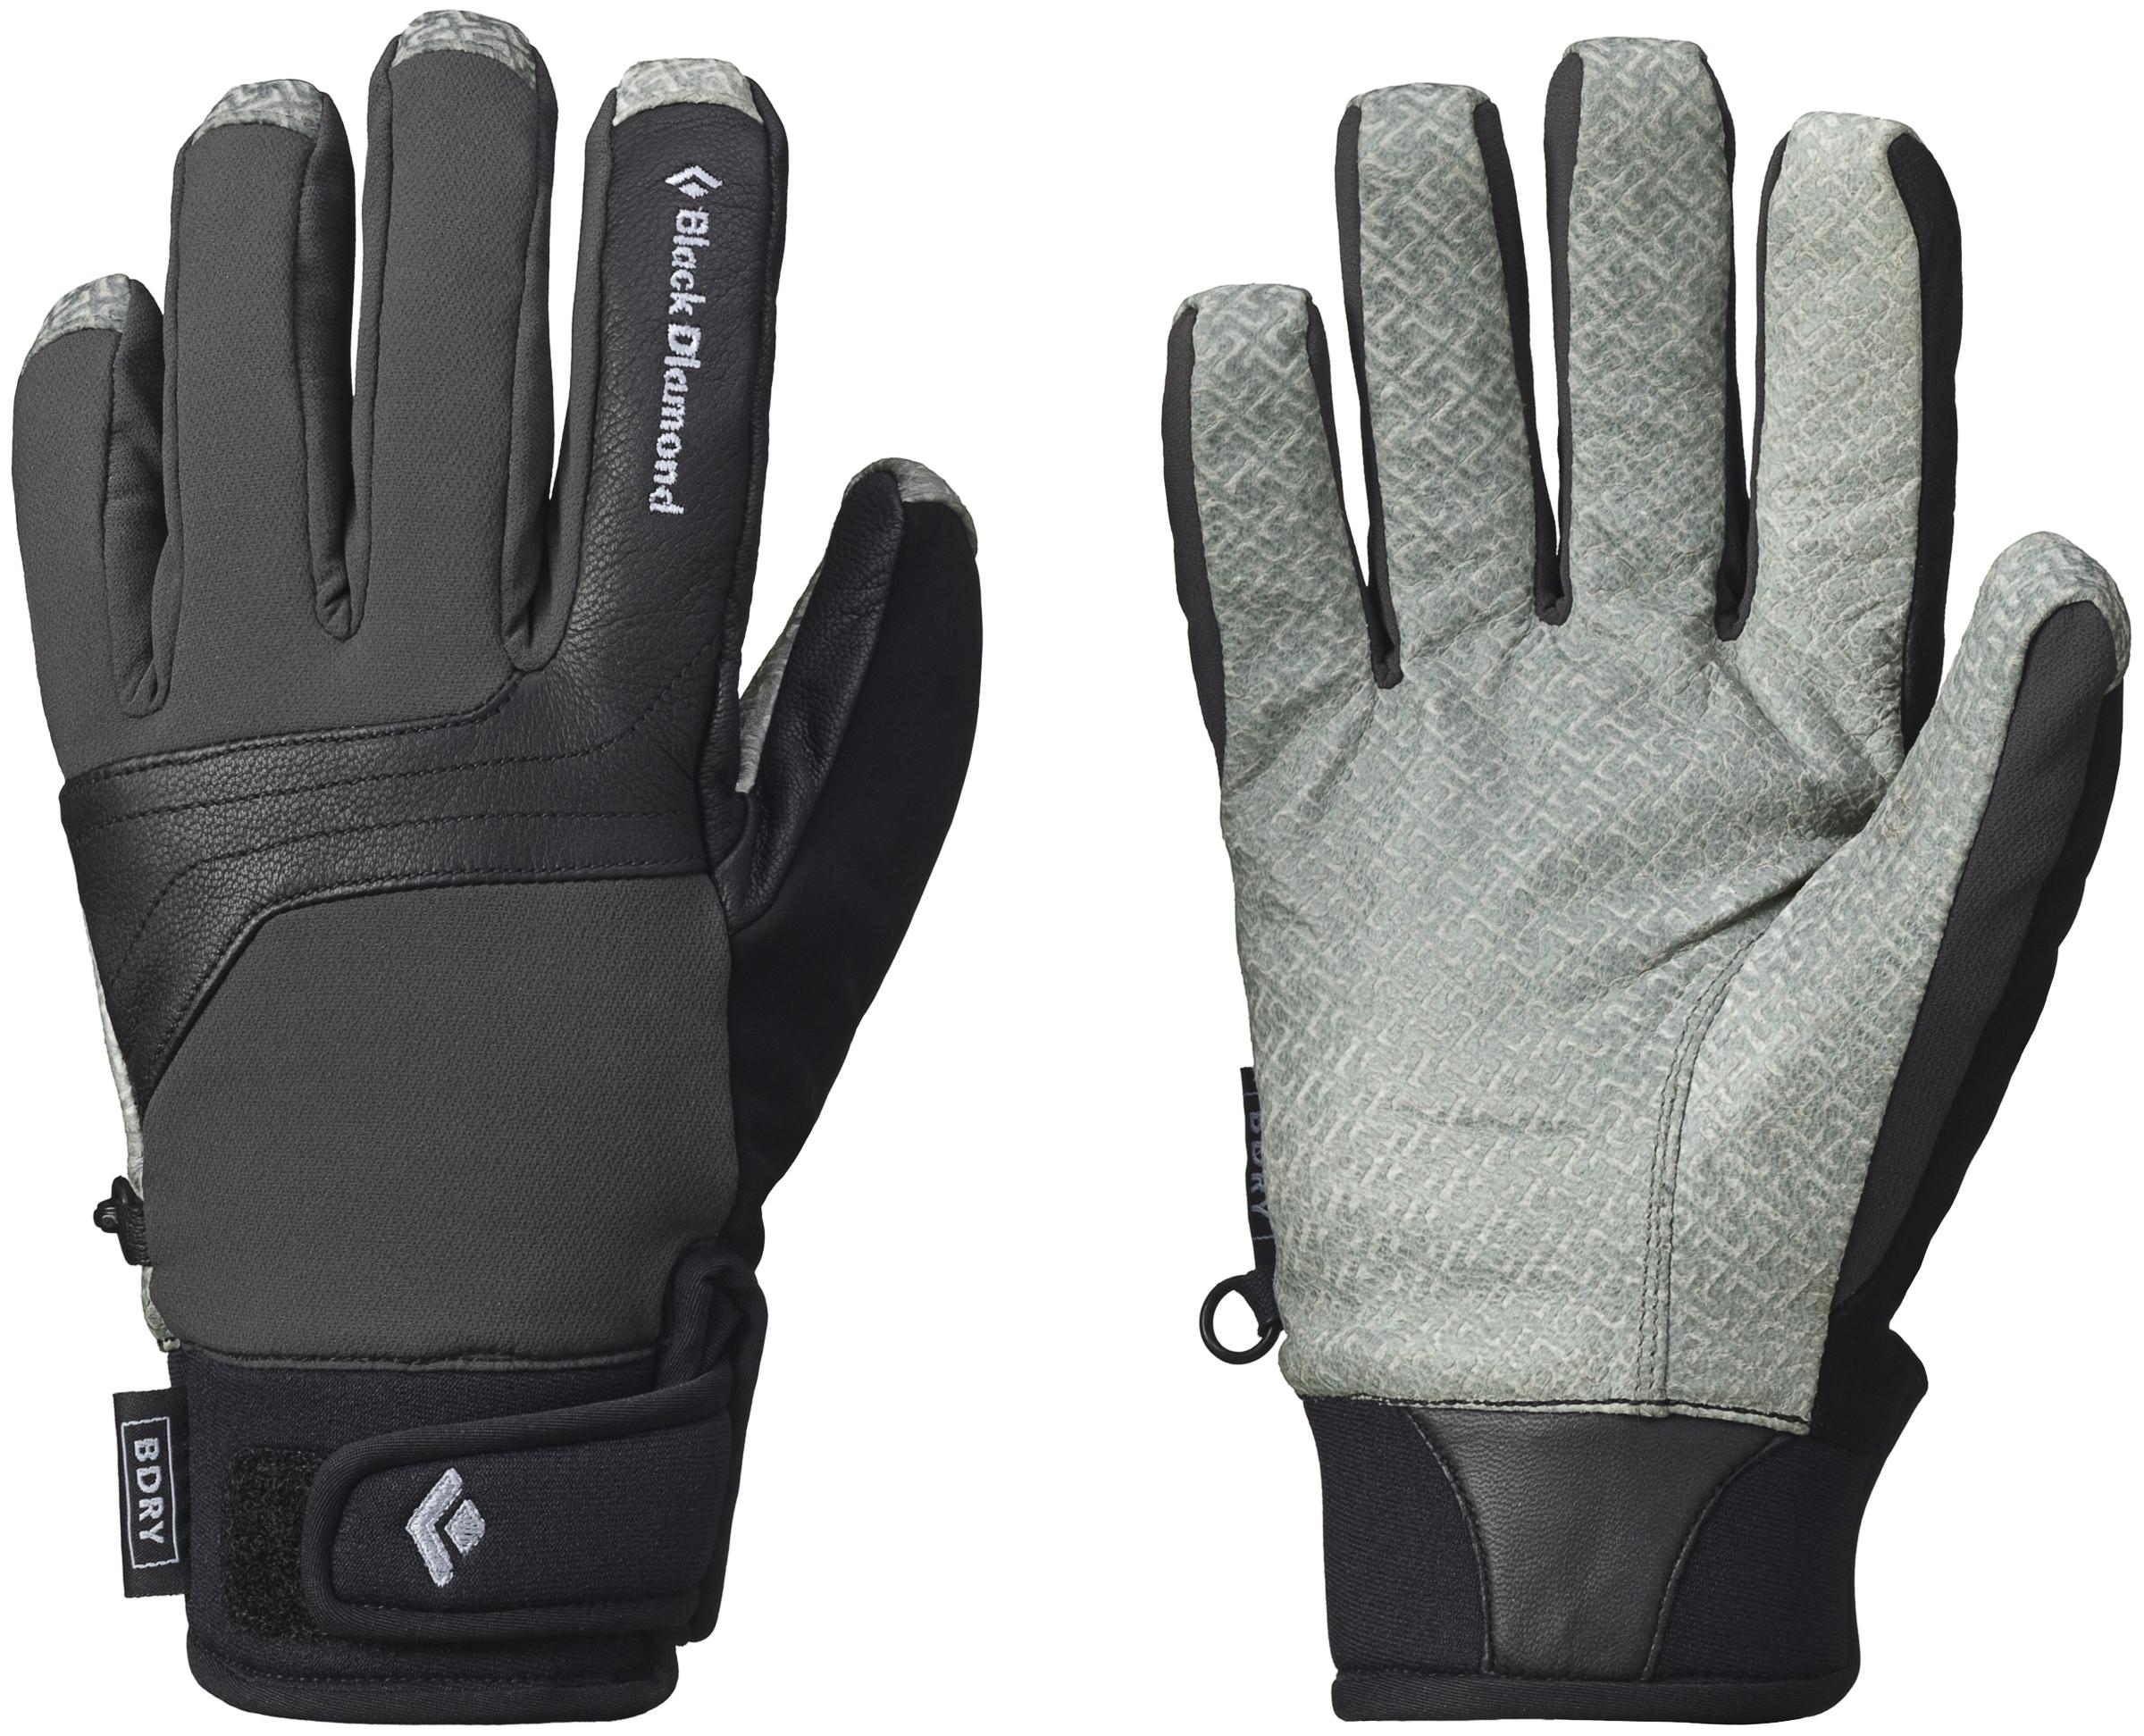 Driving gloves edmonton - Driving Gloves Edmonton 16